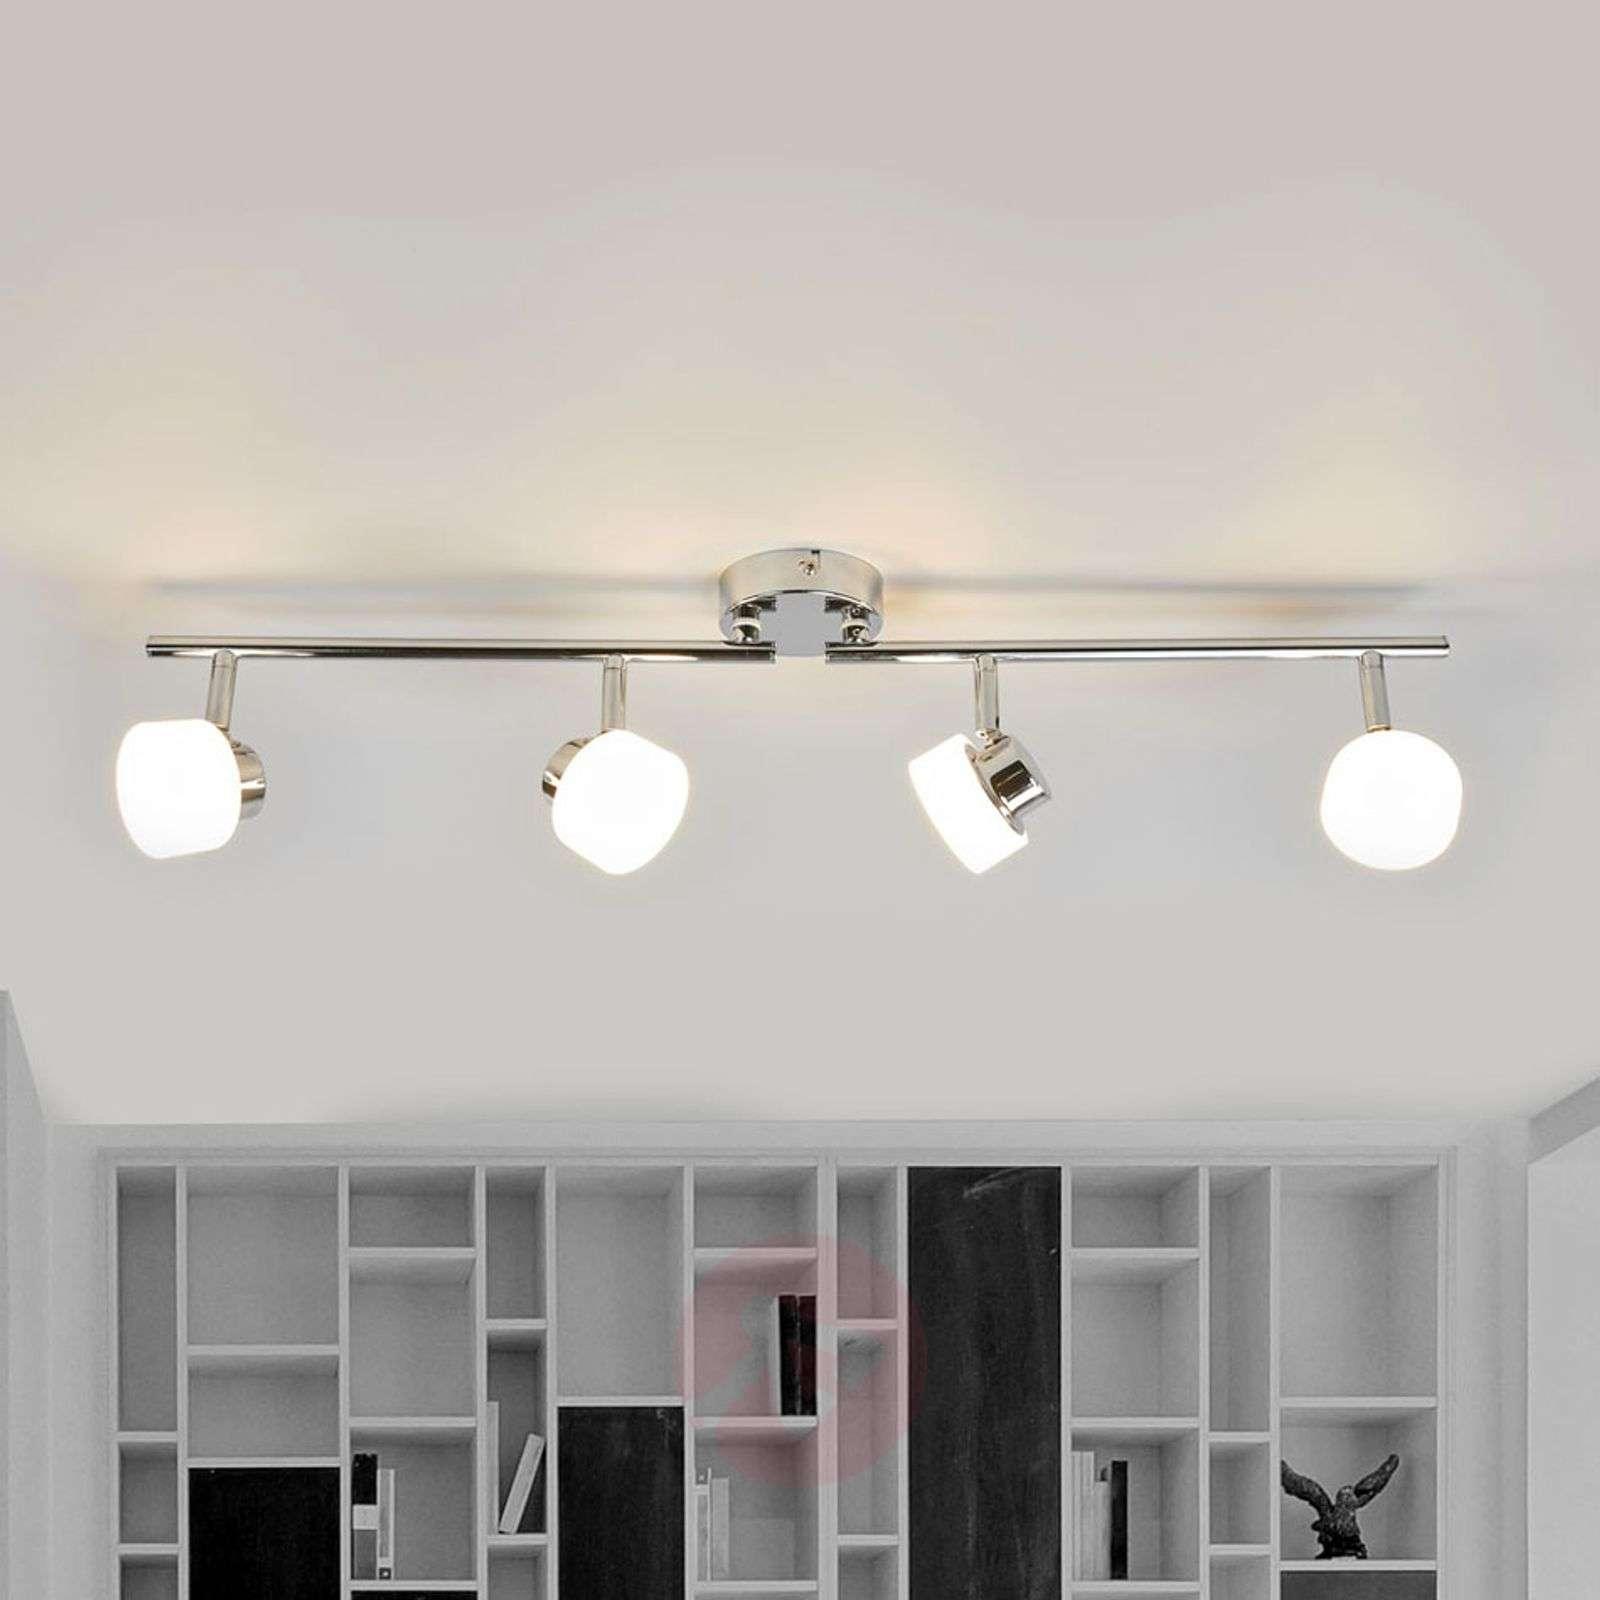 Shia LED ceiling lamp with chrome frame | Lights.ie